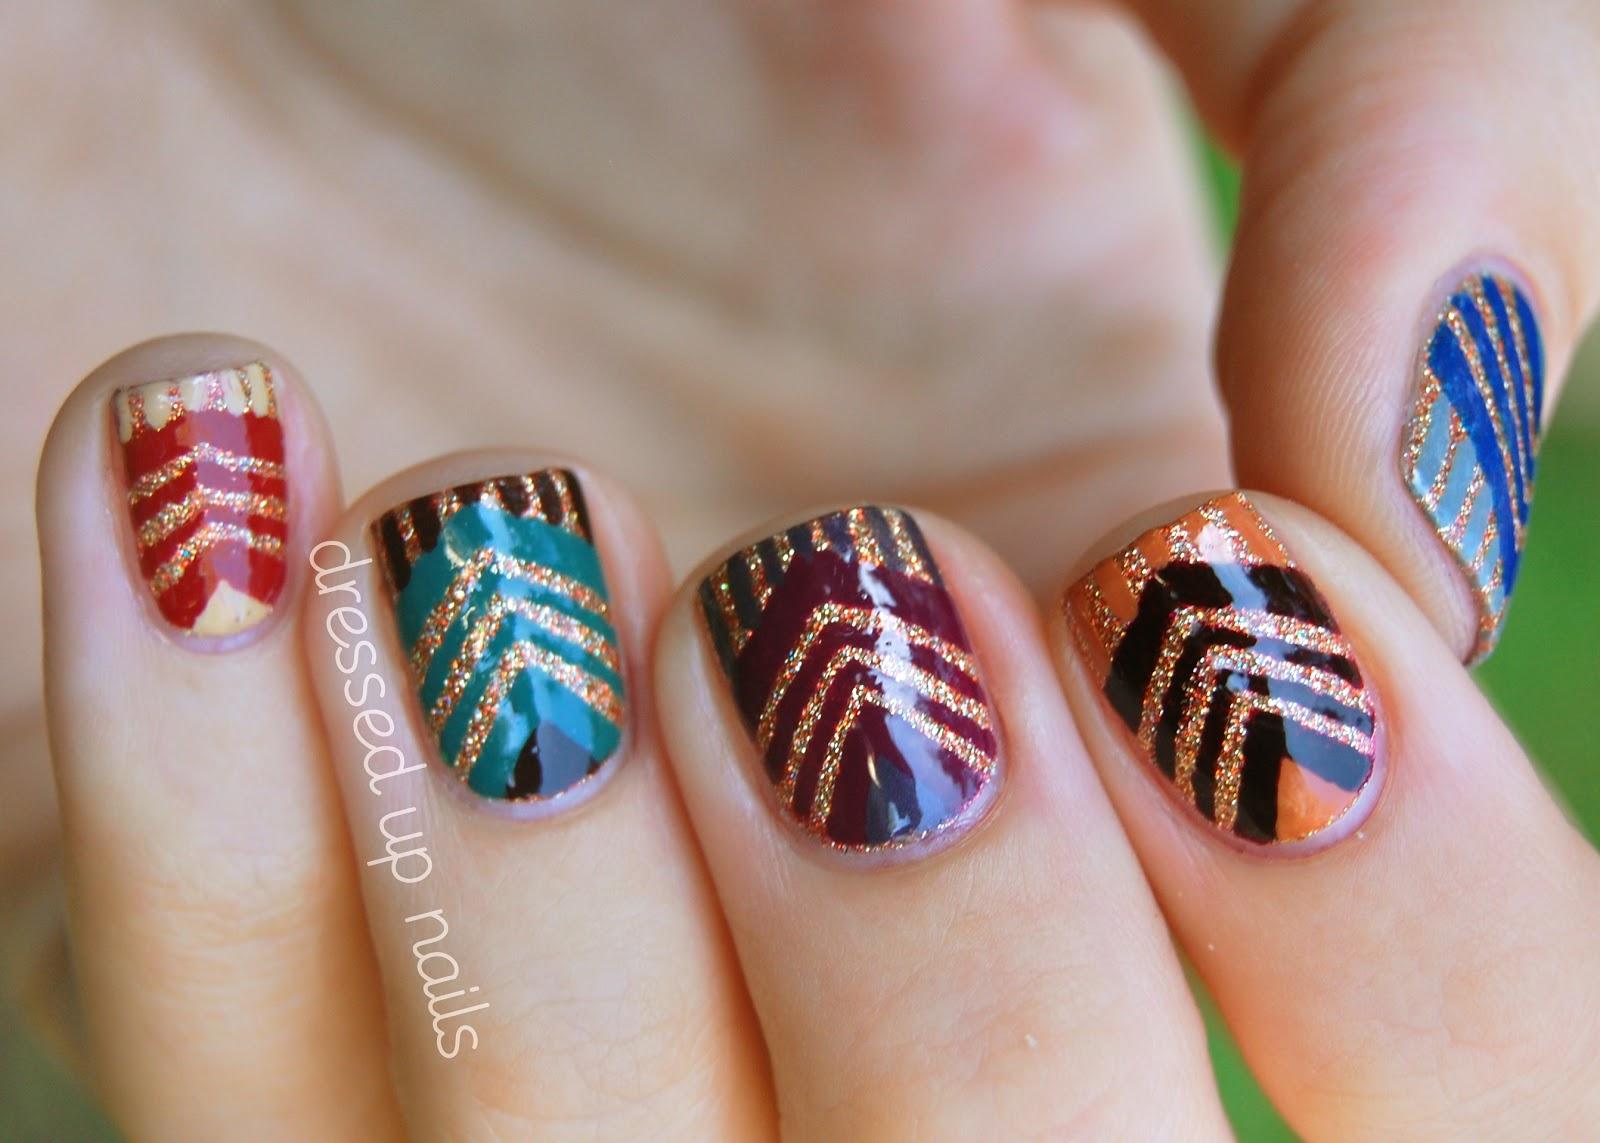 Full color nail art - China Glaze On Safari Chevron Nail Art